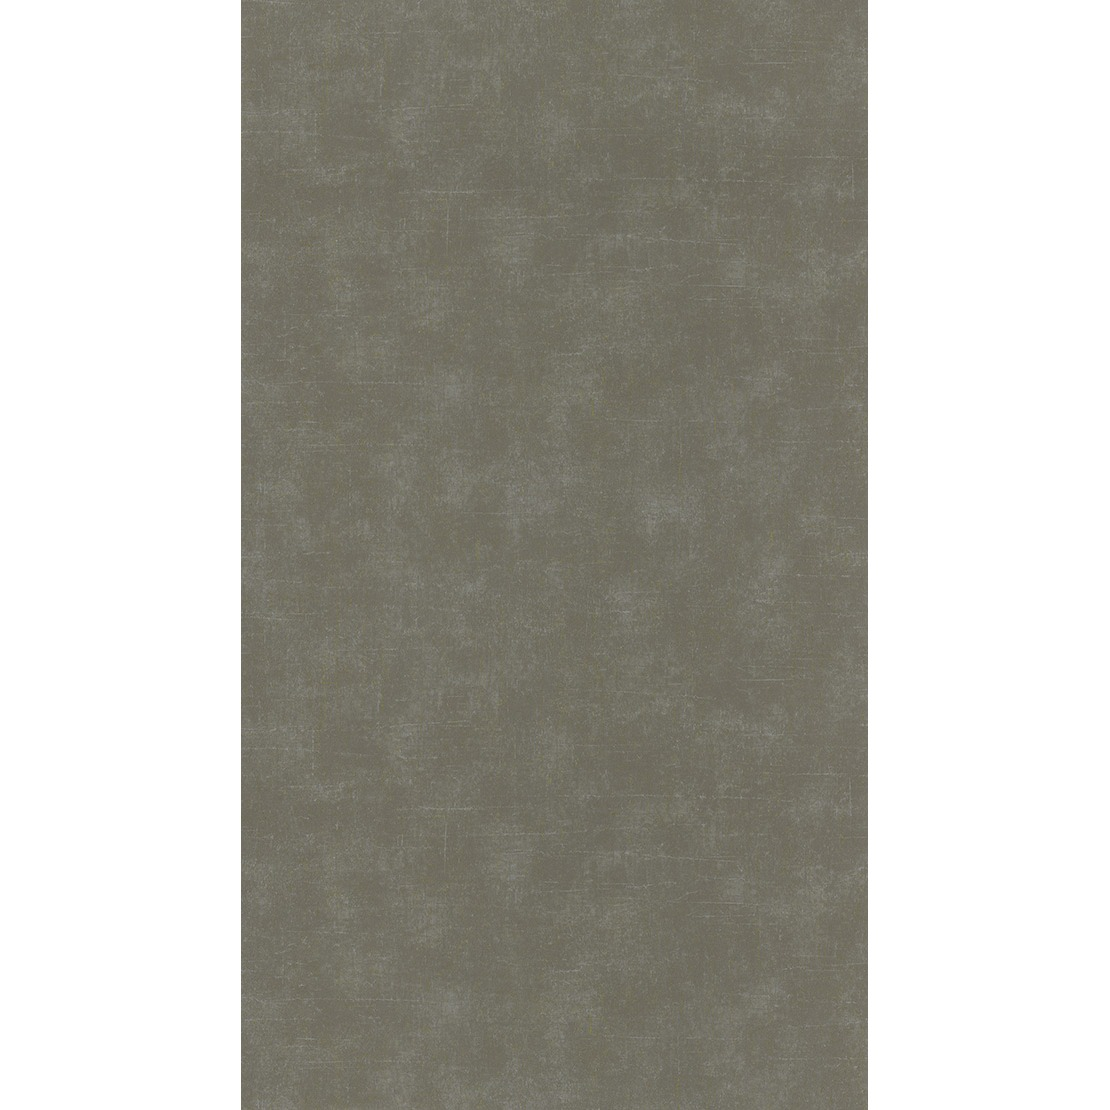 Французские обои Casadeco,  коллекция Oxyde, артикулOXY29117131